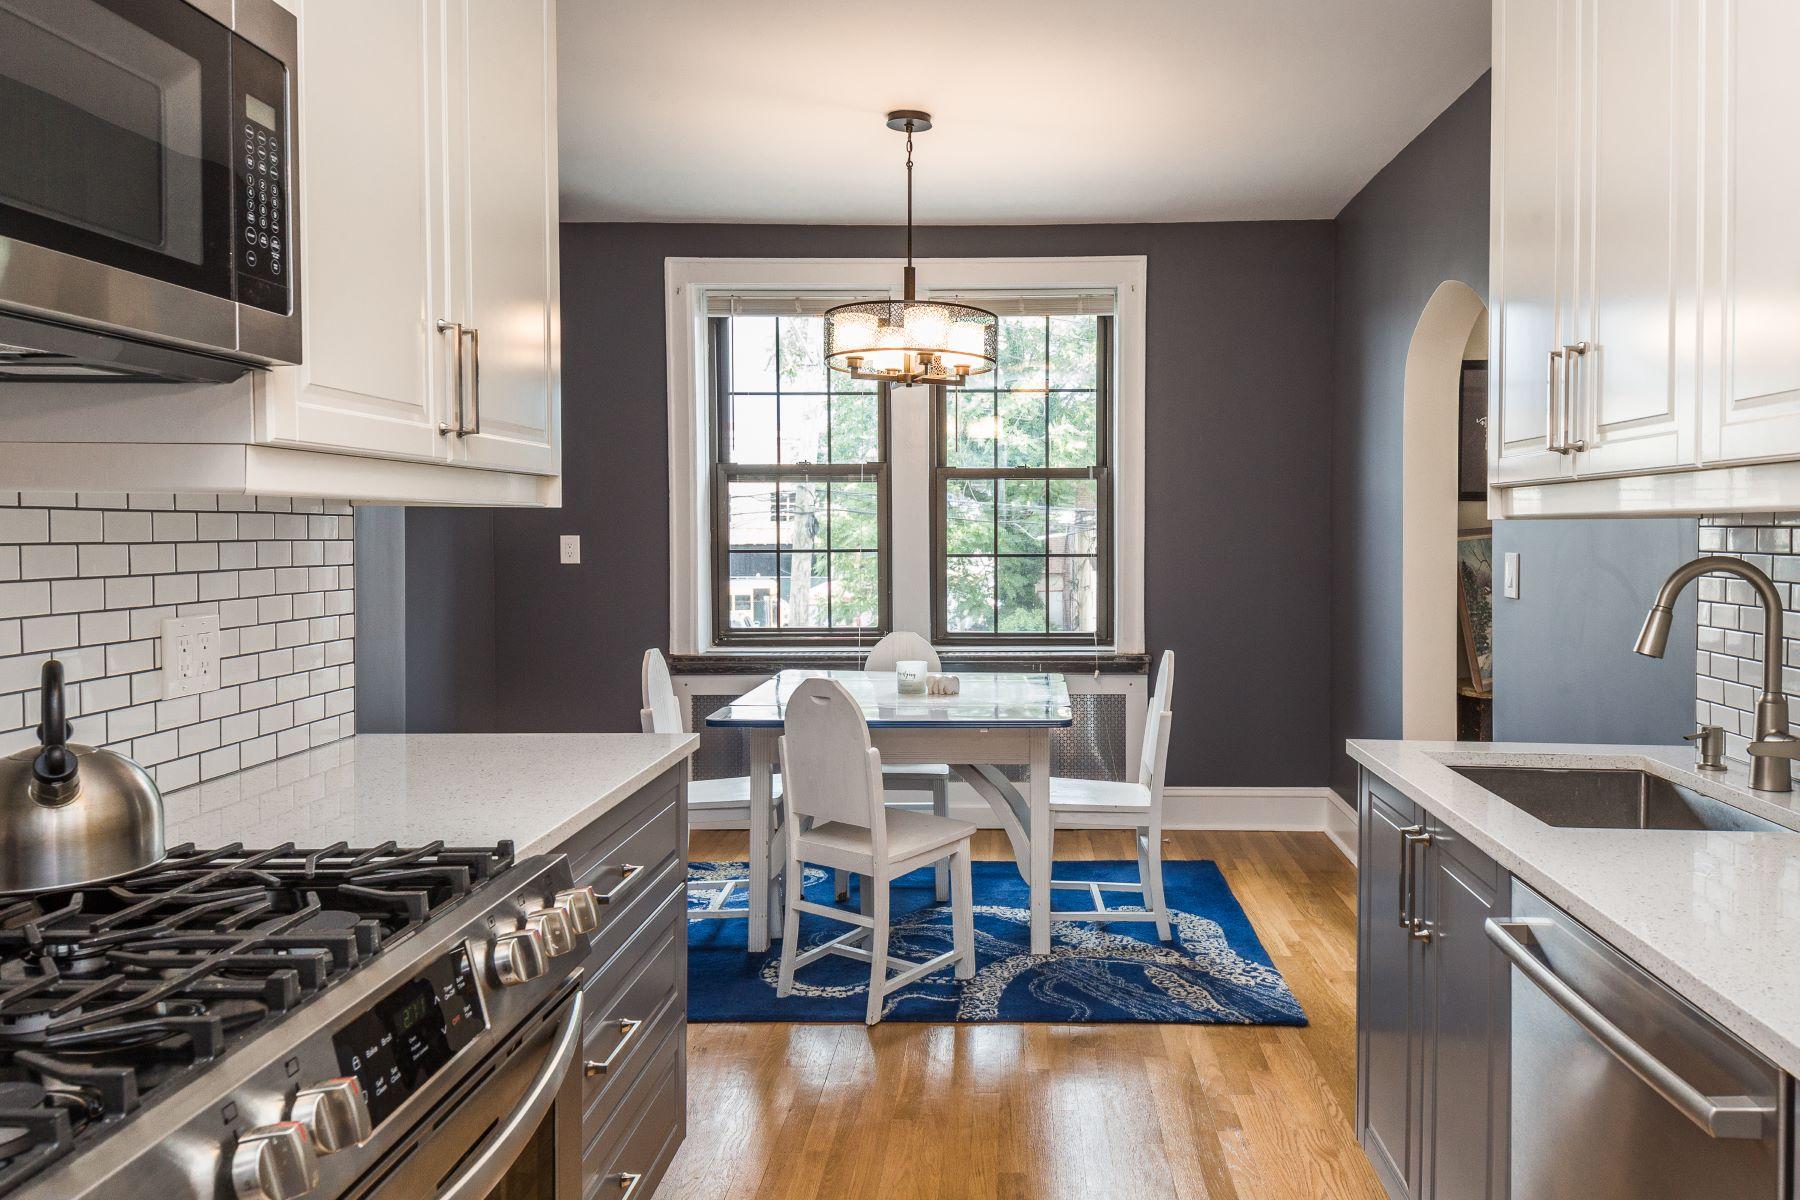 Co-op Properties für Verkauf beim Heart of Fleetwood 61 West Grand Street 2-O, Mount Vernon, New York 10552 Vereinigte Staaten